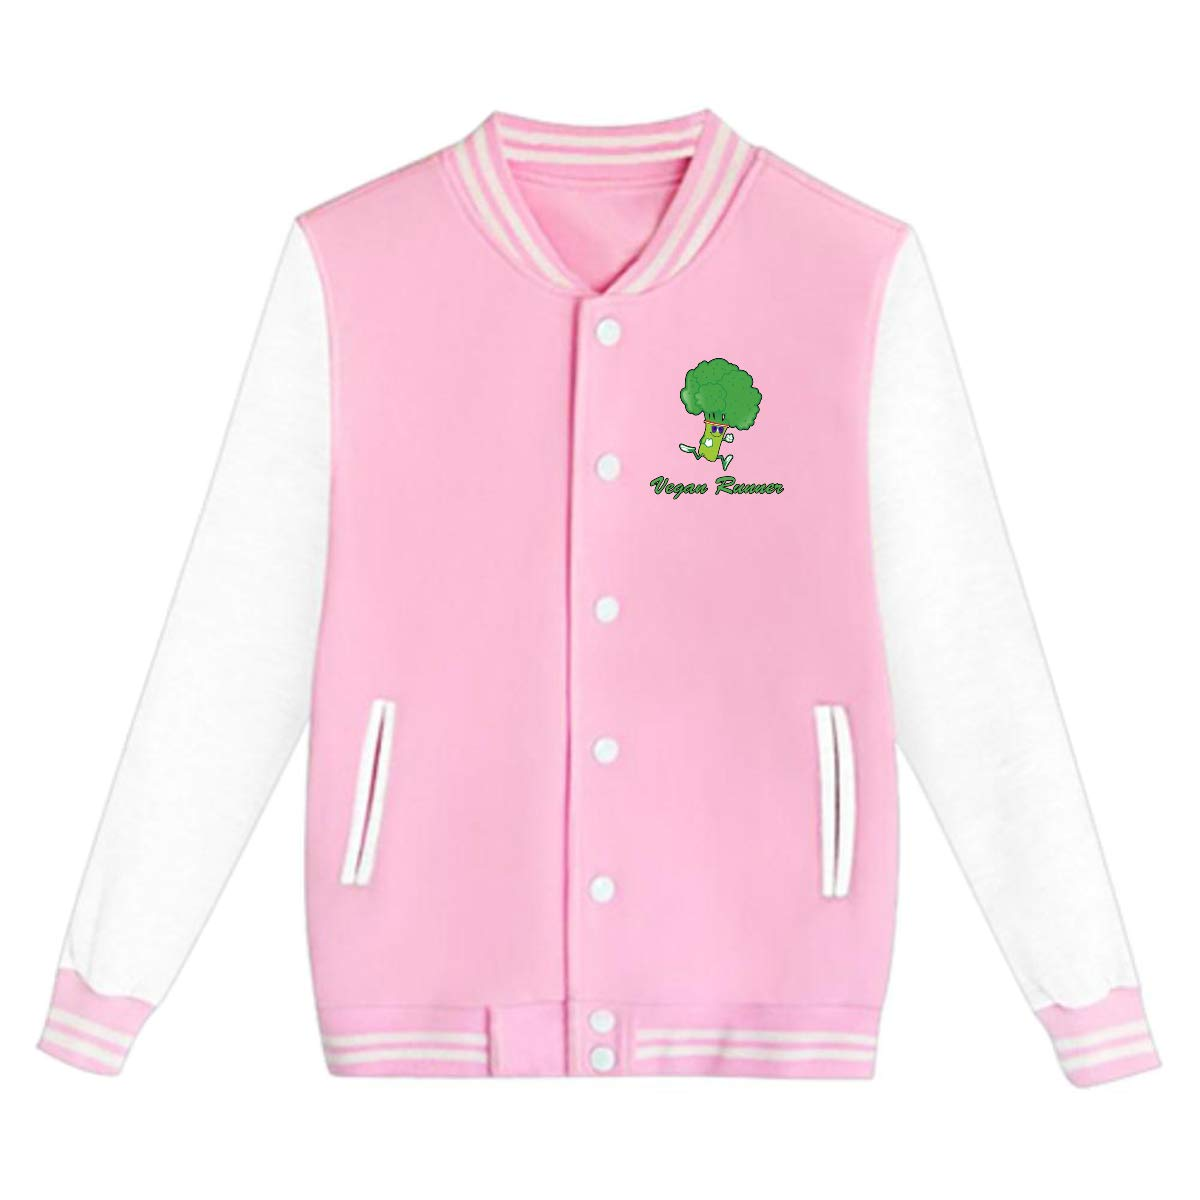 Bing4Bing Funny Vegan Runner Teens Coats Boys Or Girls Casual Baseball Jacket//Uniform Team Jackets Winter Coats